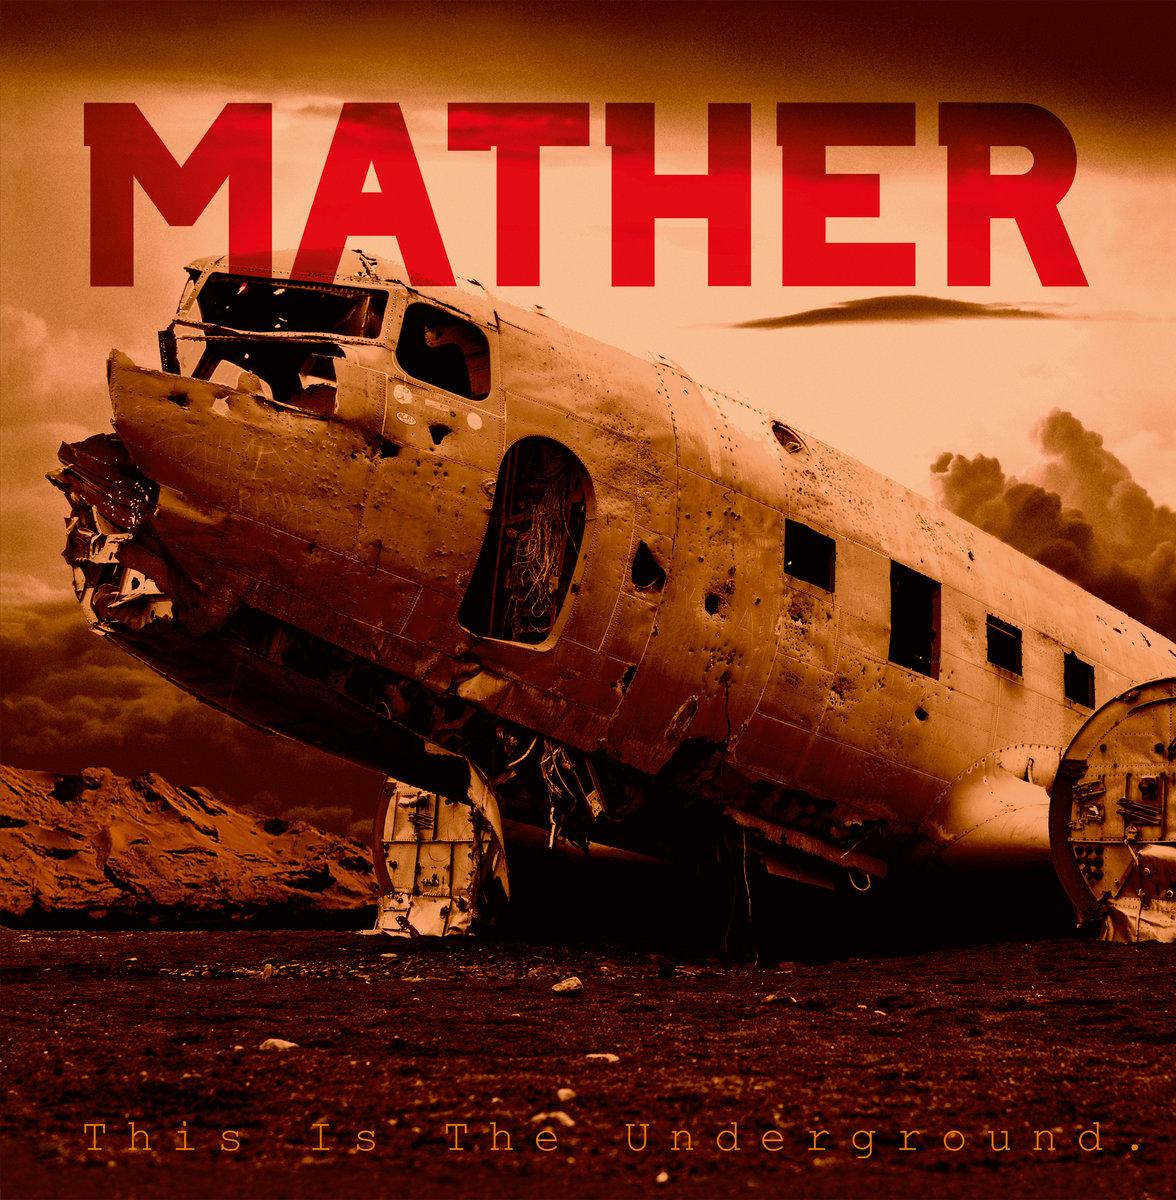 Mather artwork